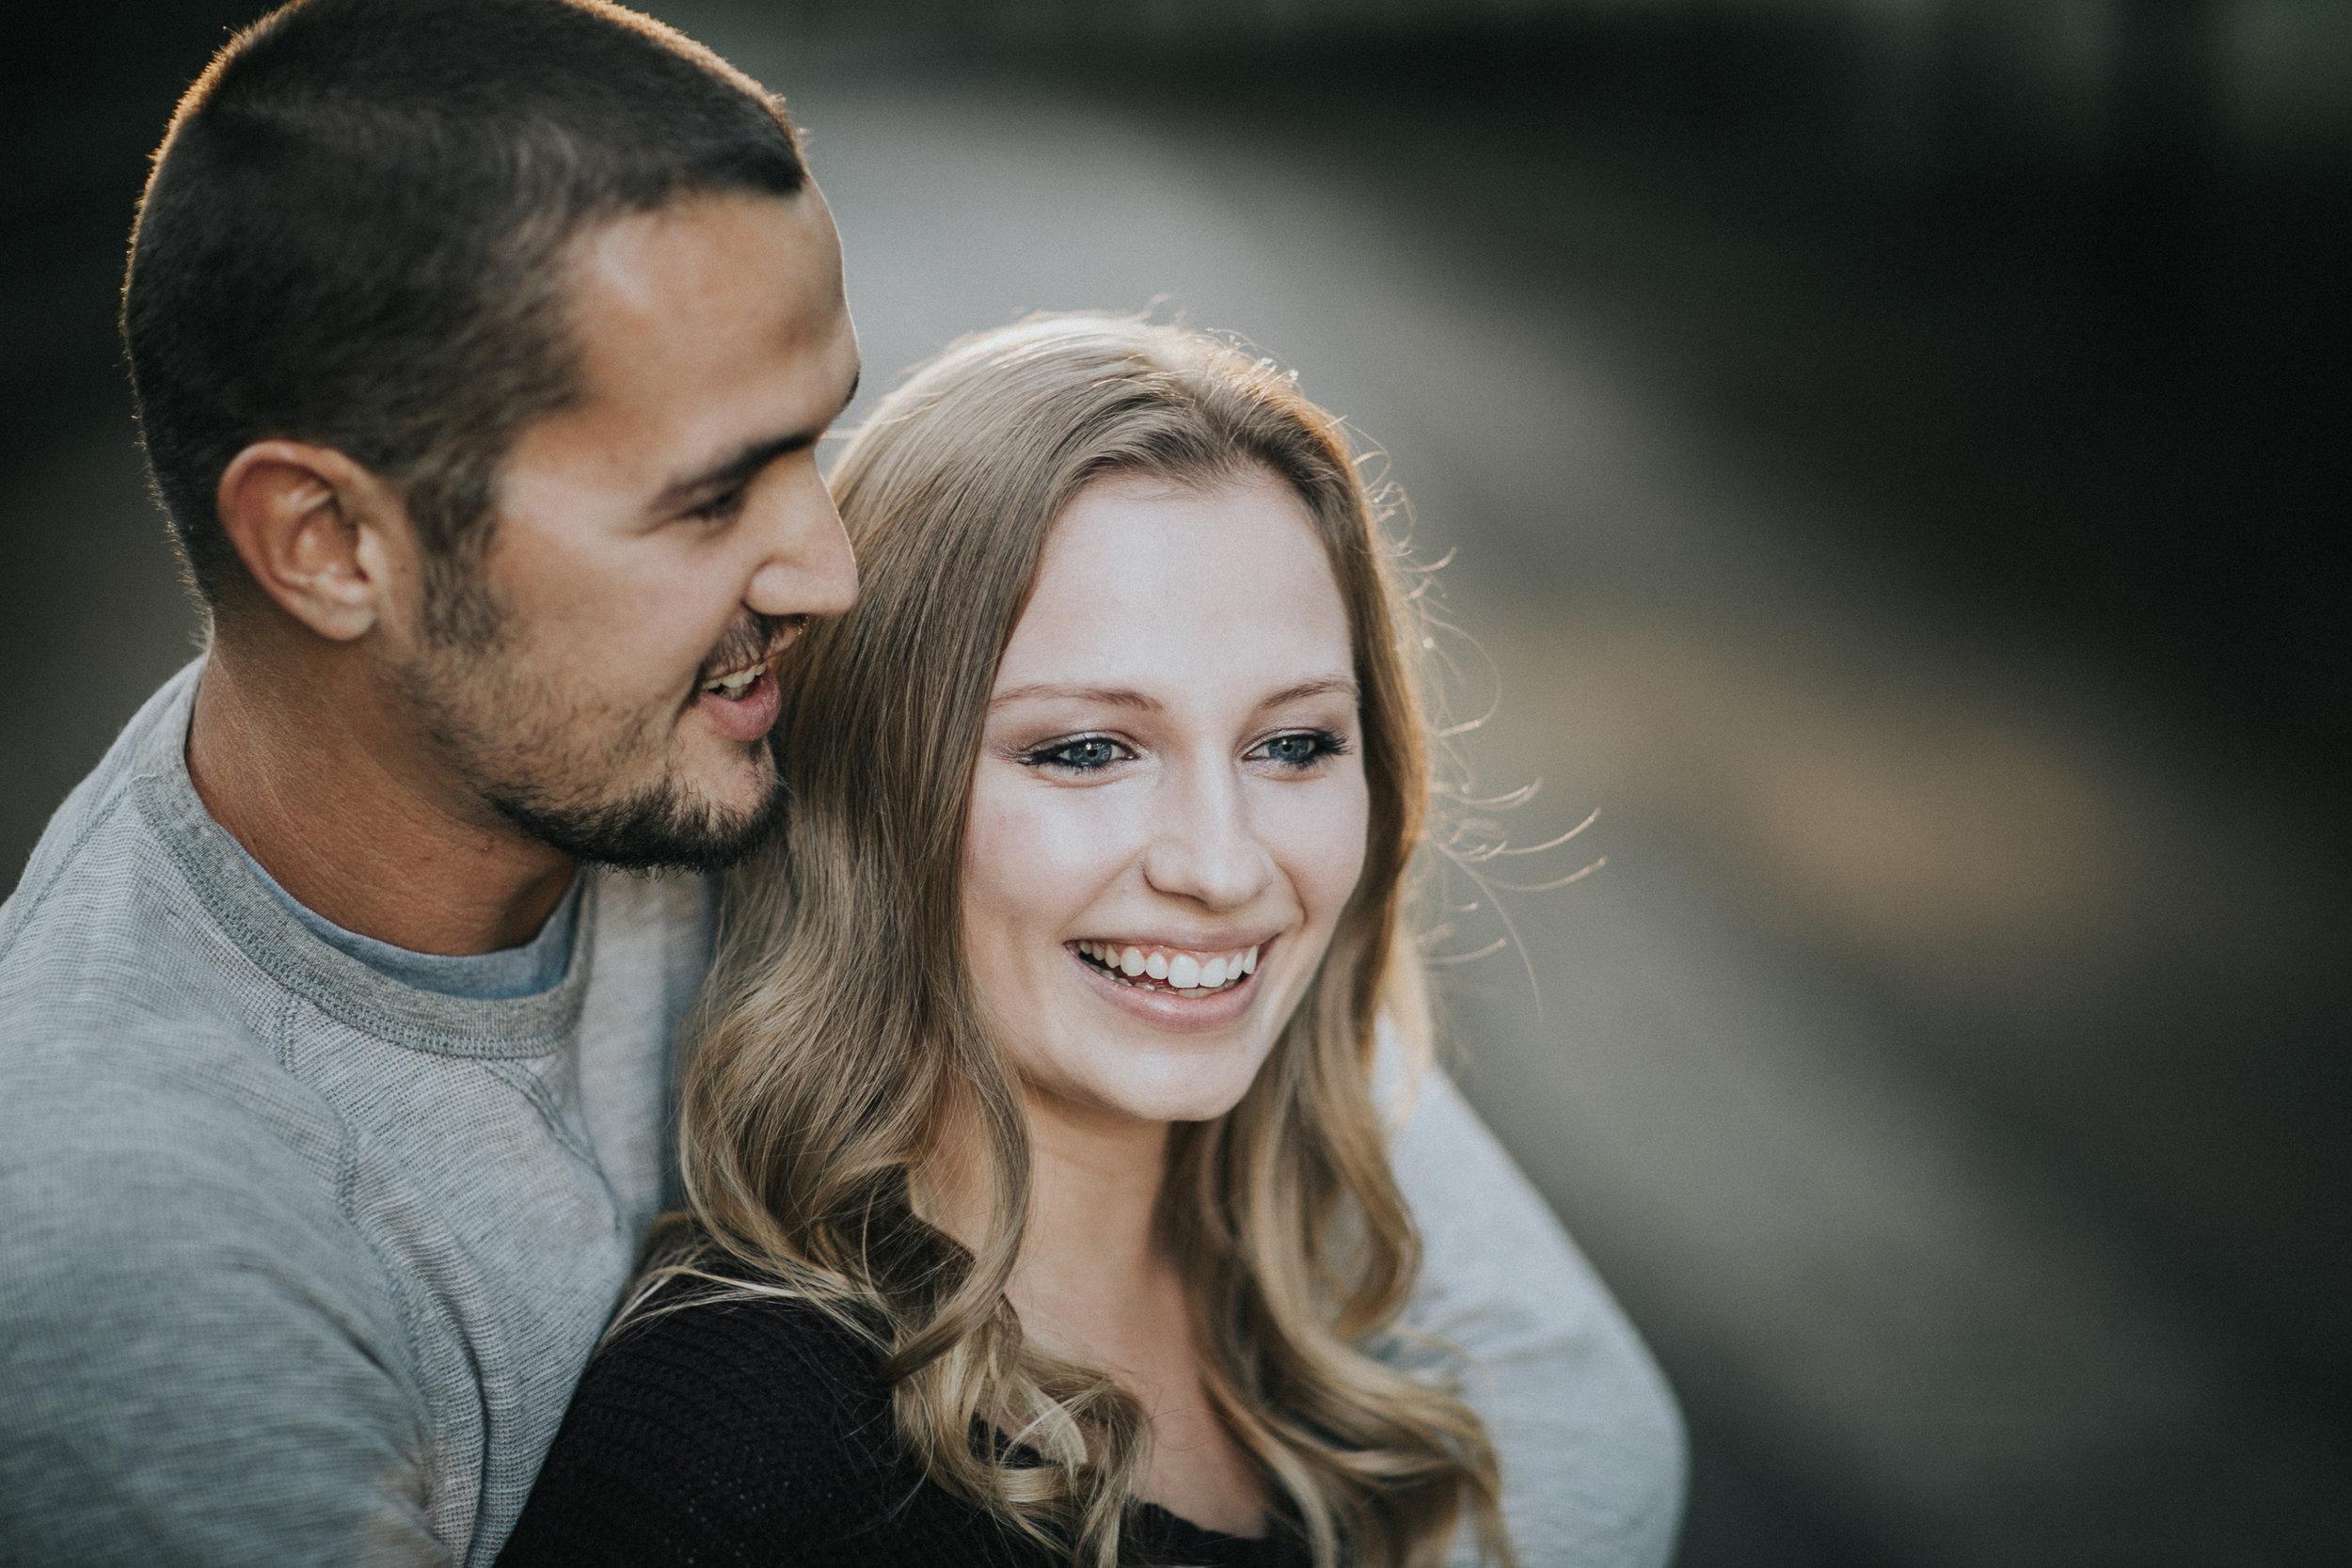 New-Jersey-Wedding-Photography-Engagement-Smithville-Megan&Nick-62.jpg